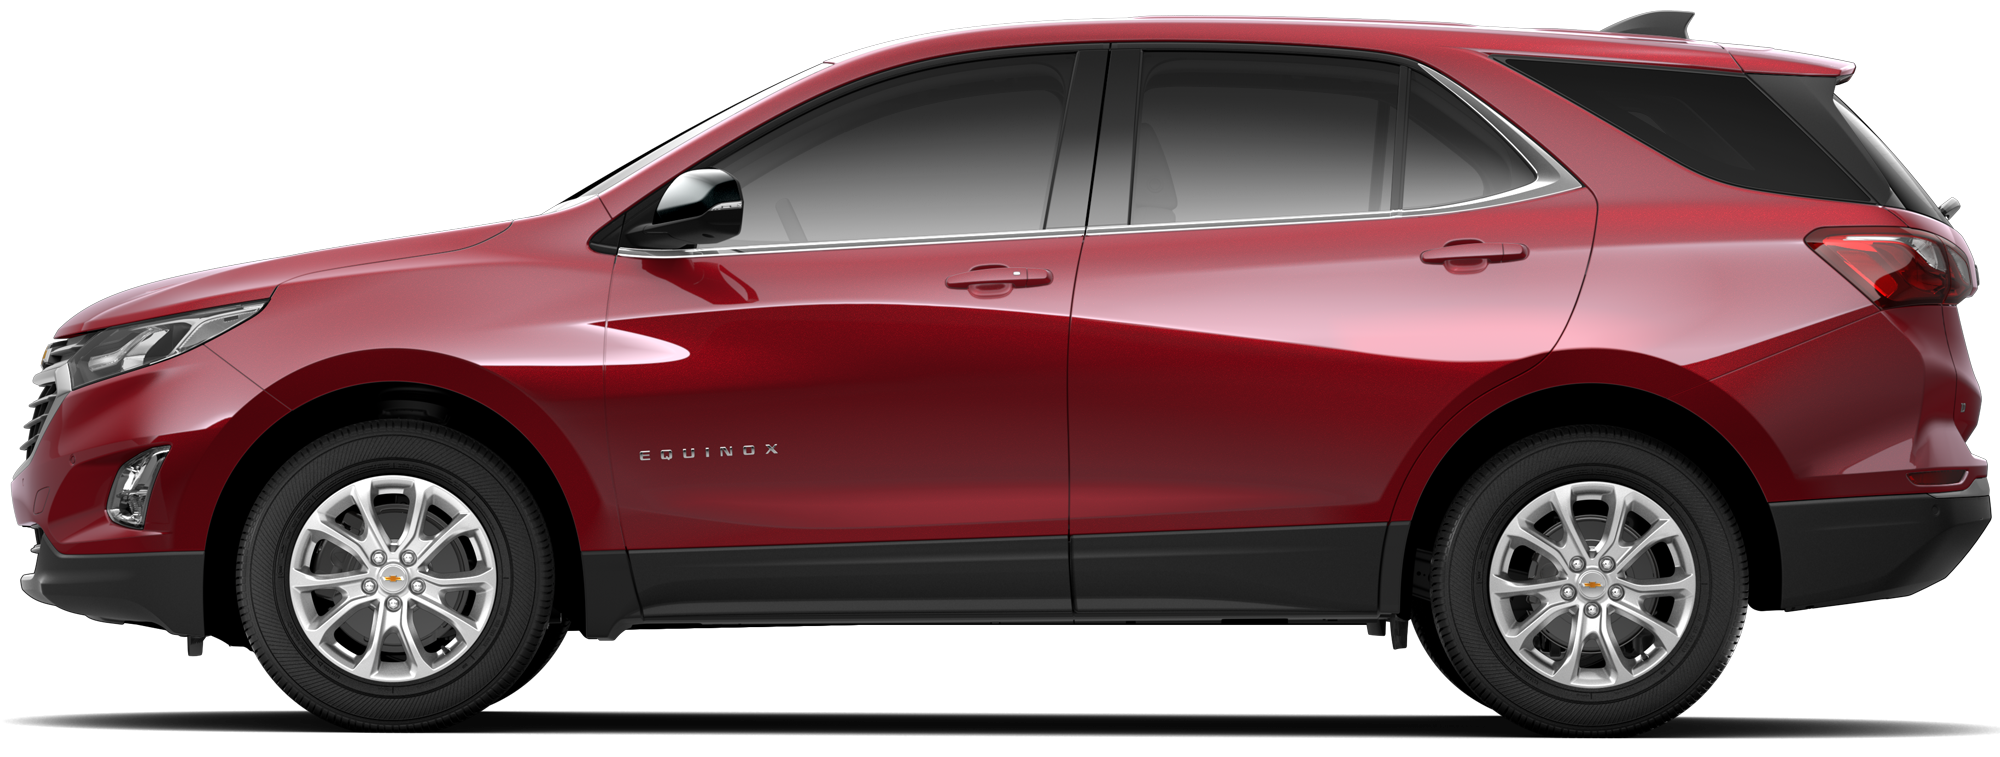 2021 Chevrolet Equinox SUV L